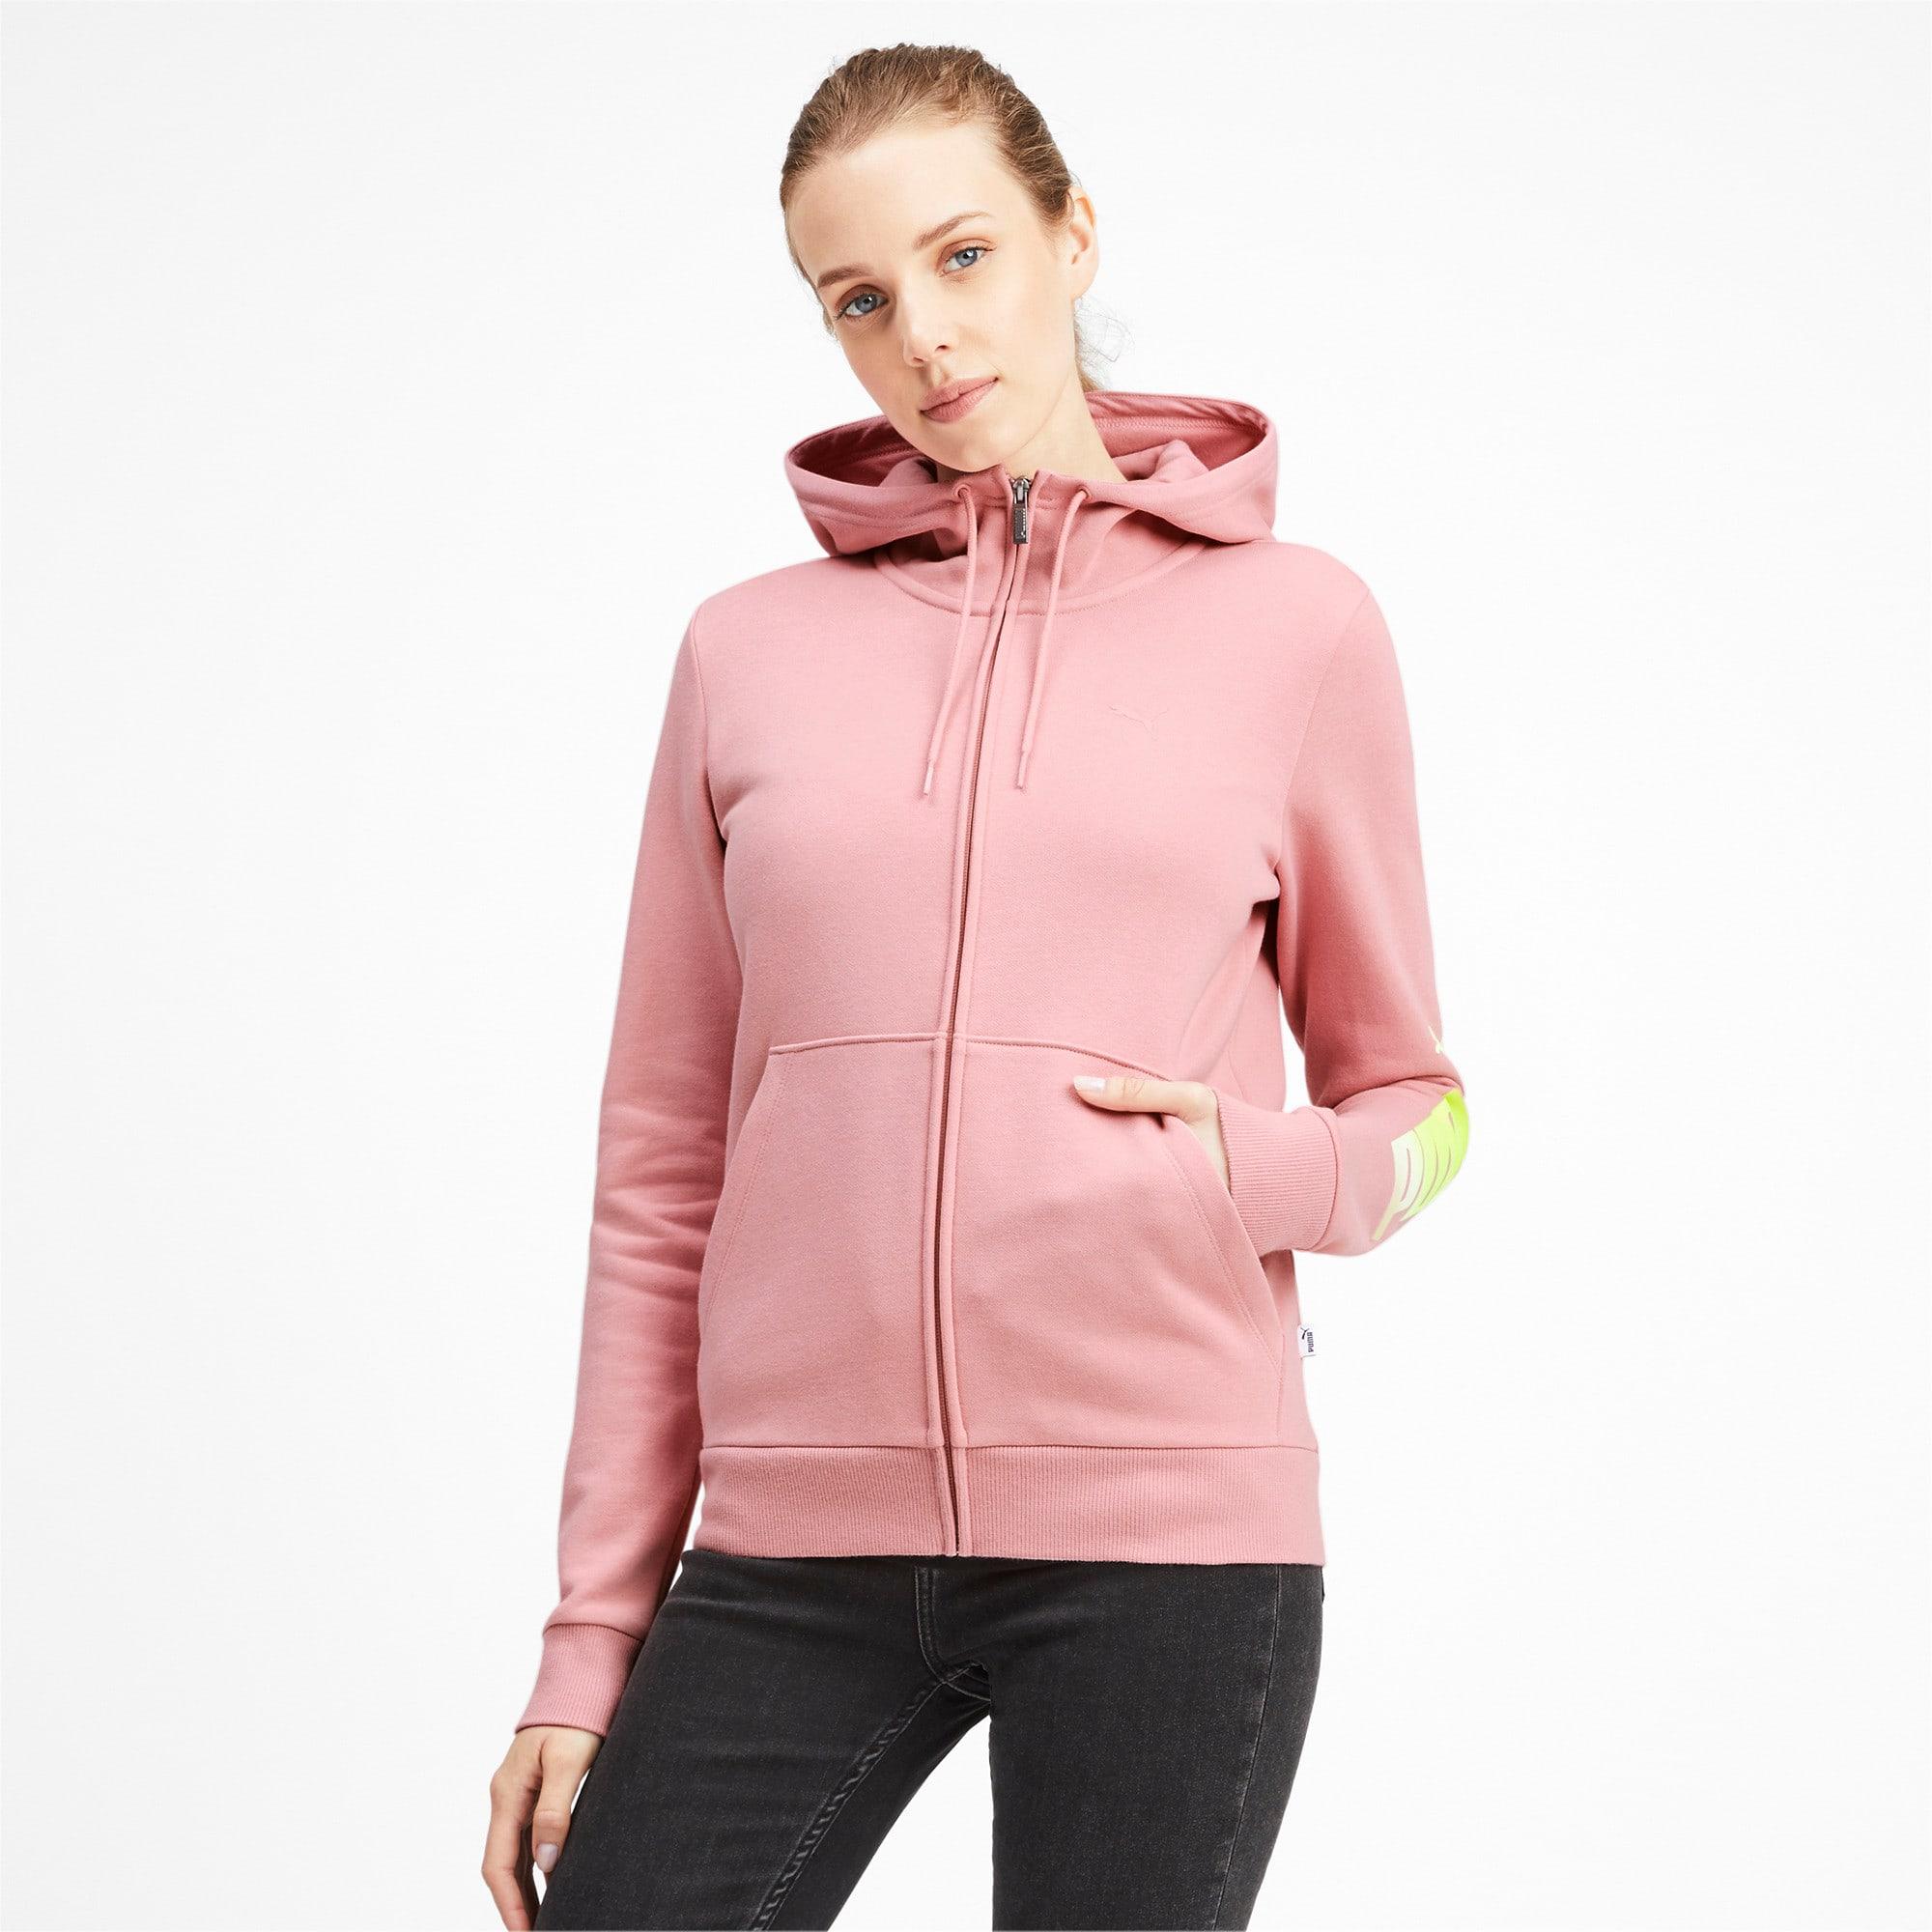 Thumbnail 2 of Essentials Women's Hooded Fleece Jacket, Bridal Rose, medium